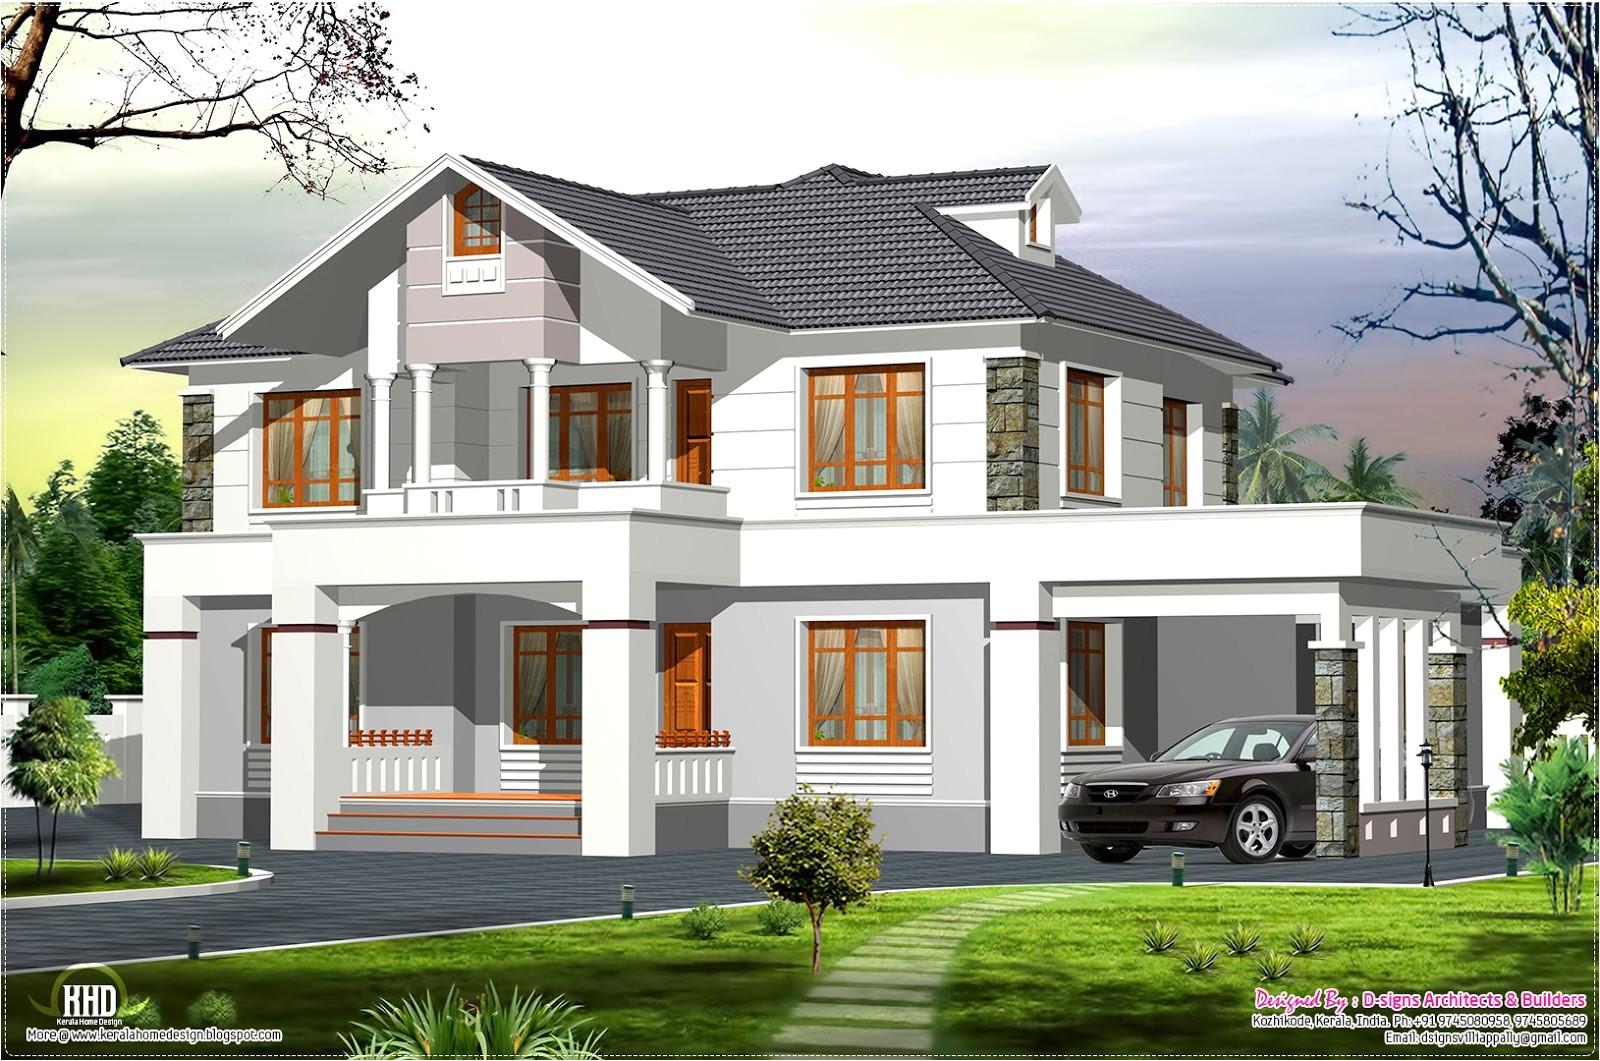 Western Home Plans 2400 Sq Feet Western Style Home In Kerala Kerala Home